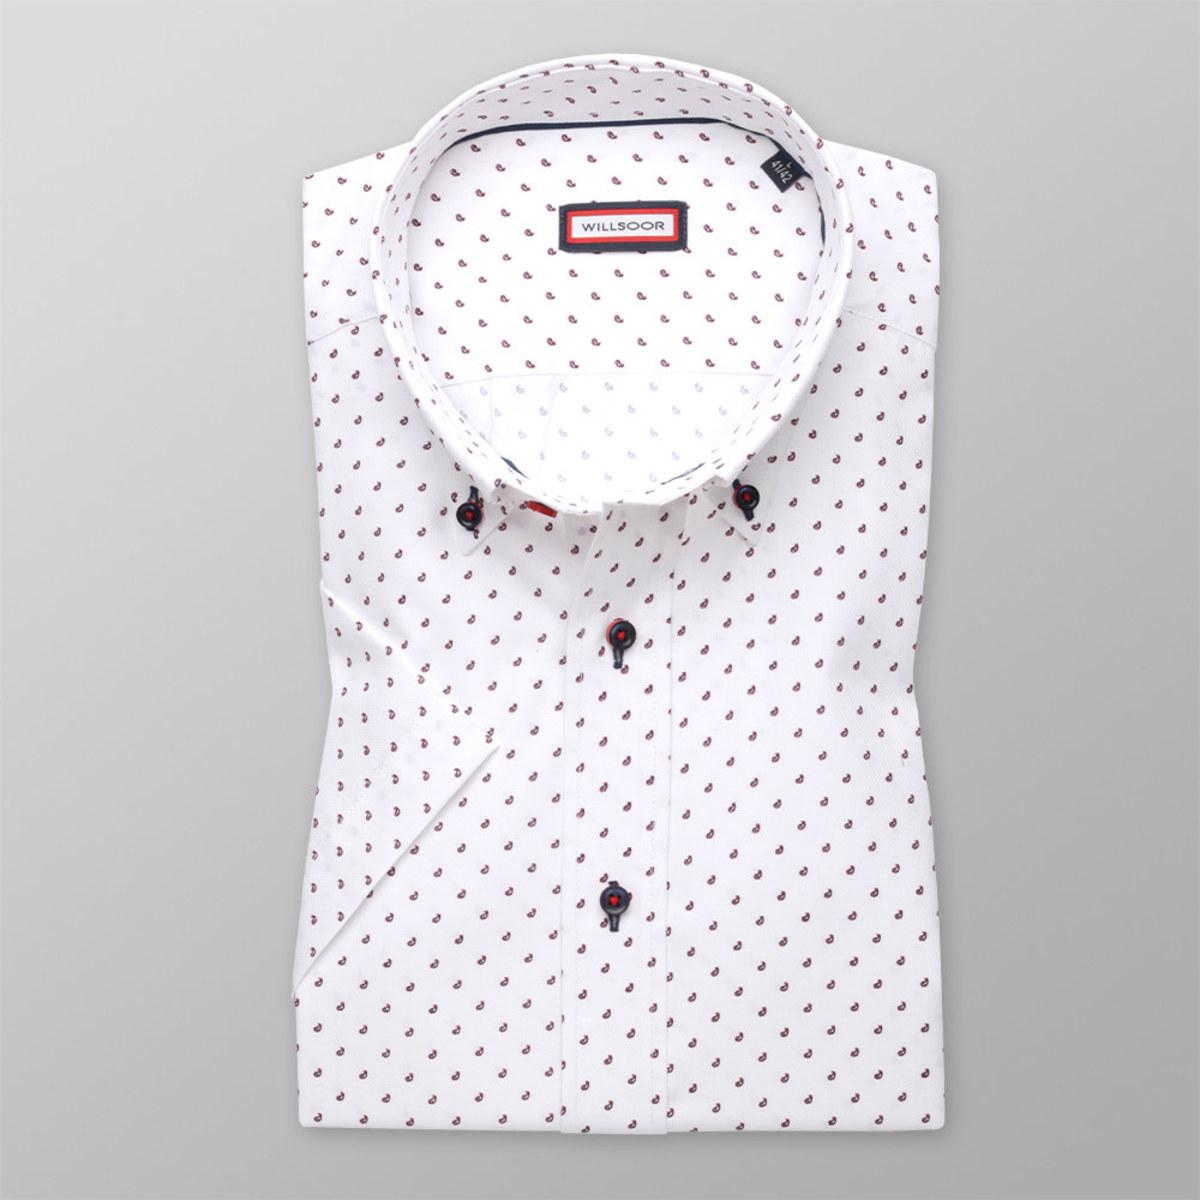 Košeľa Slim Fit s potlačou kvapiek (výška 176 - 182) 10589 176-182 / L (41/42)